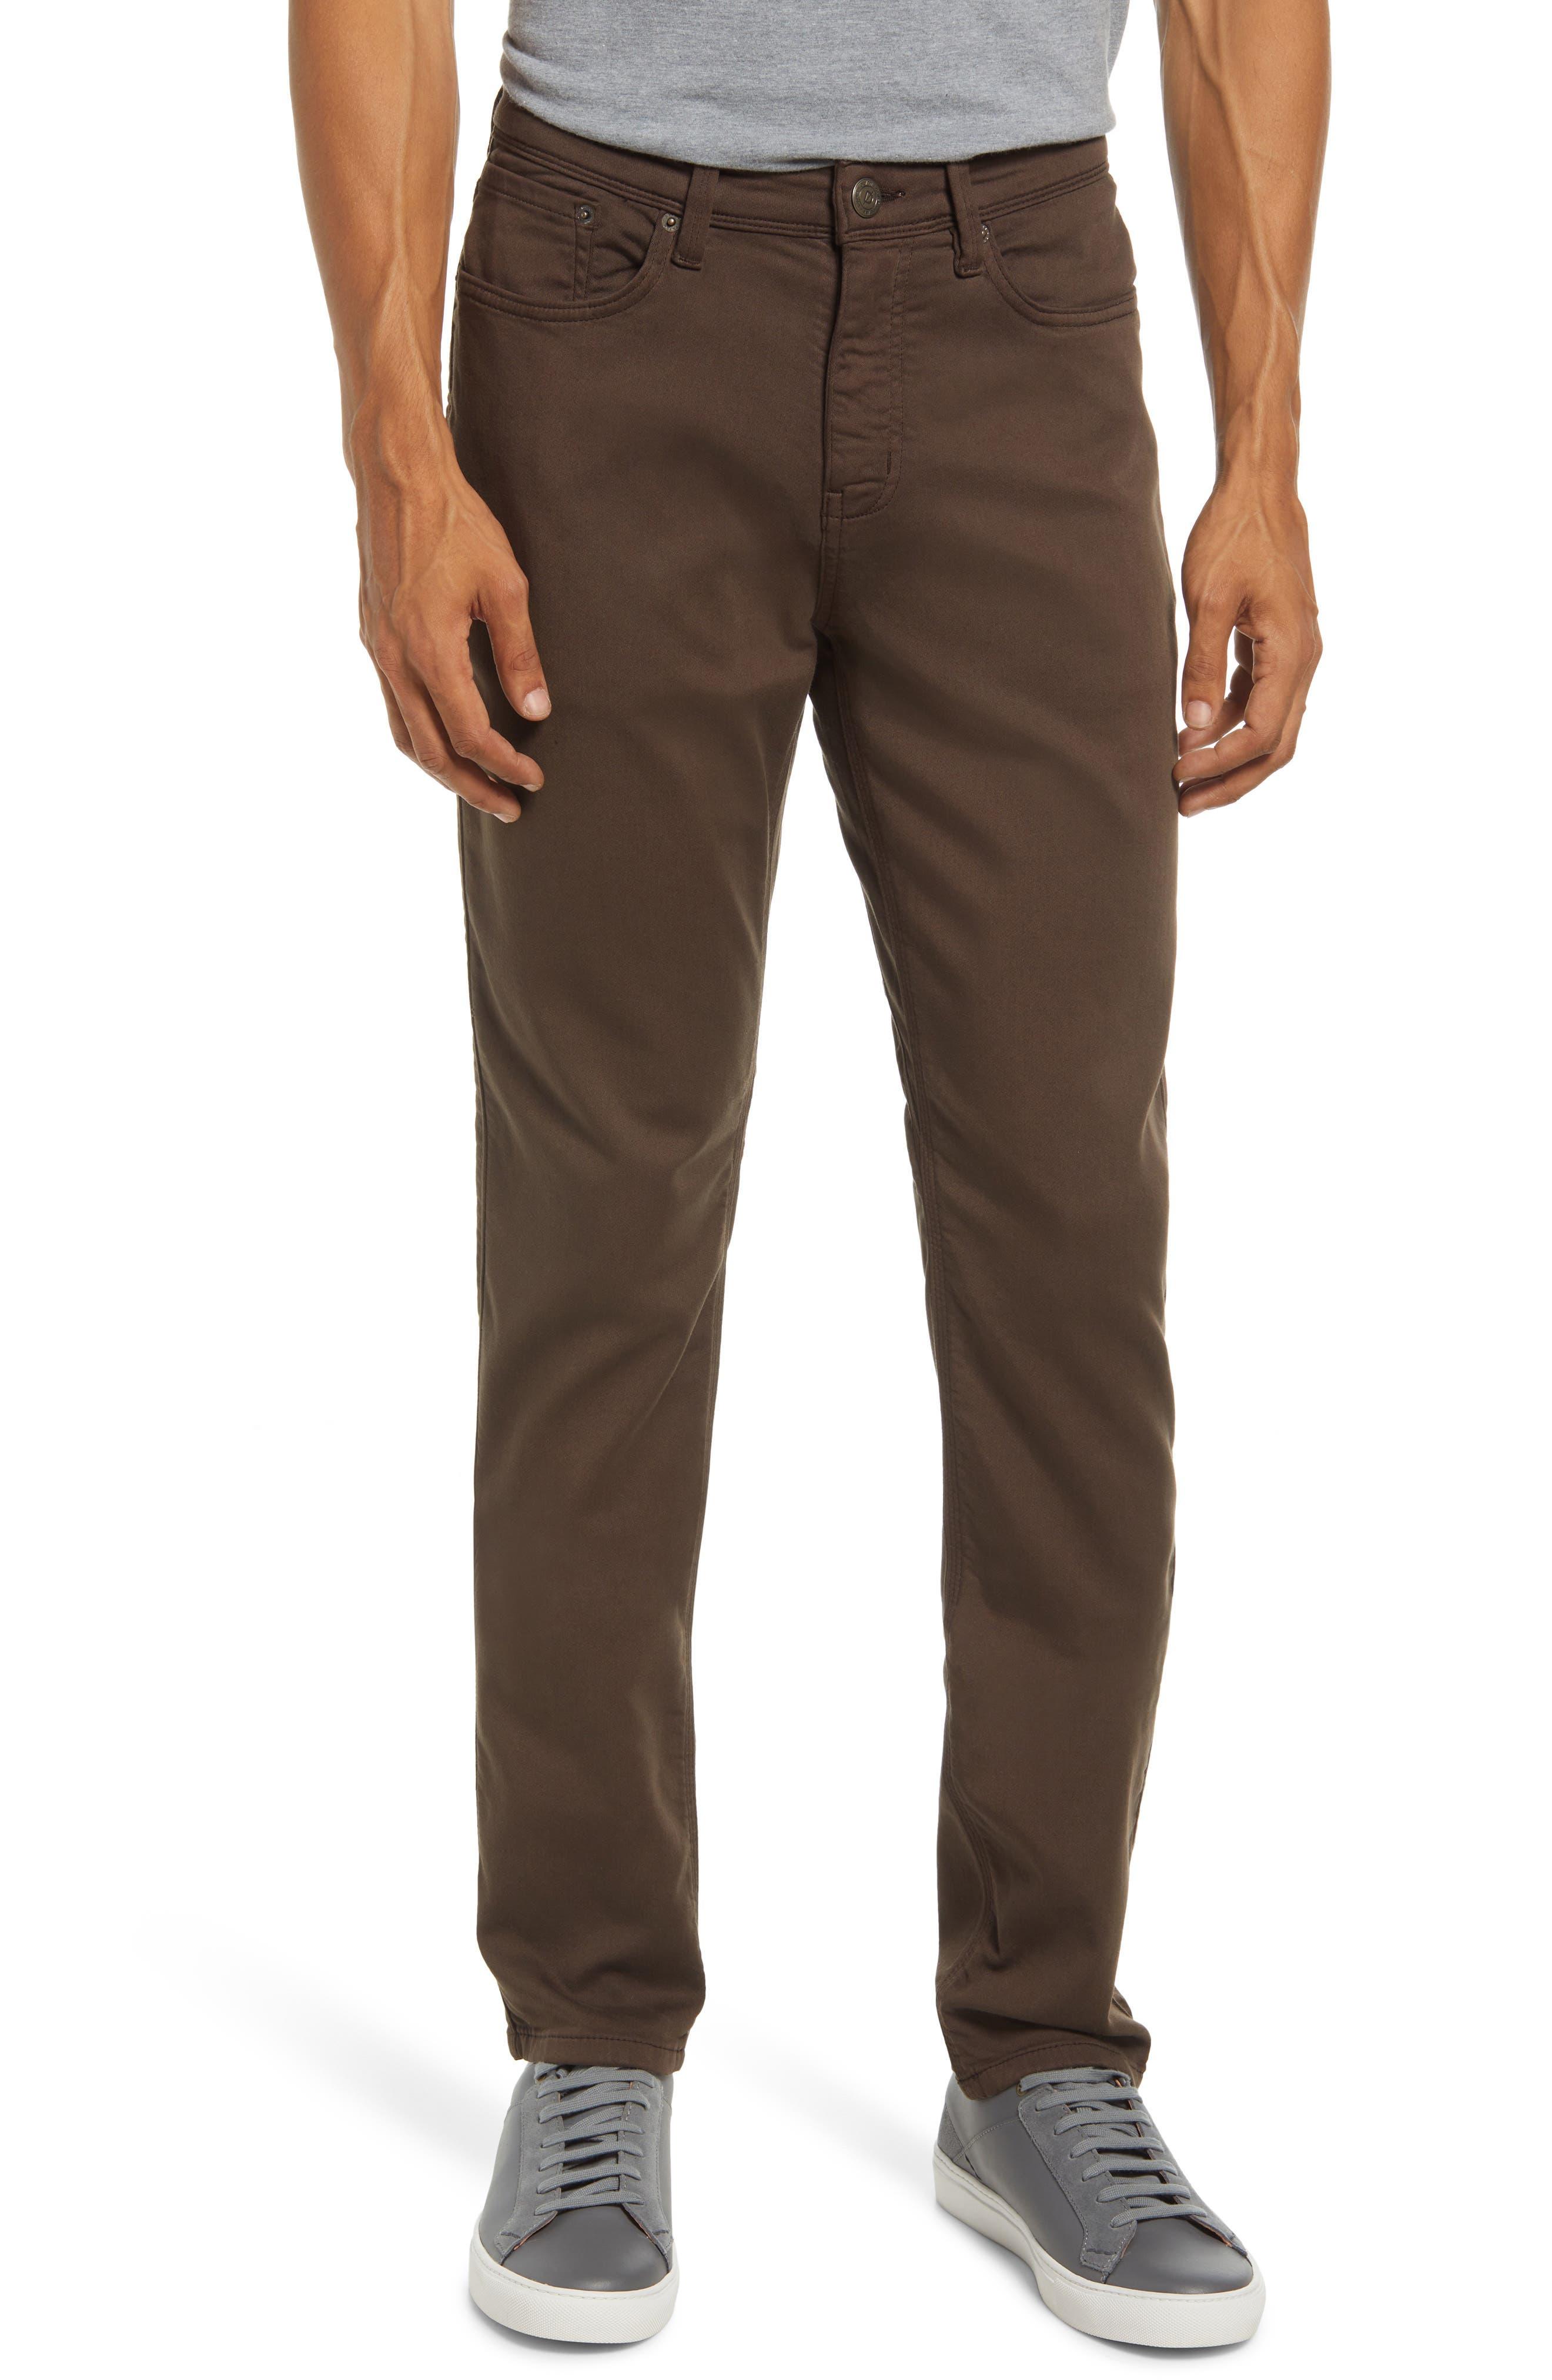 No Sweat Slim Fit Performance Five-Pocket Pants